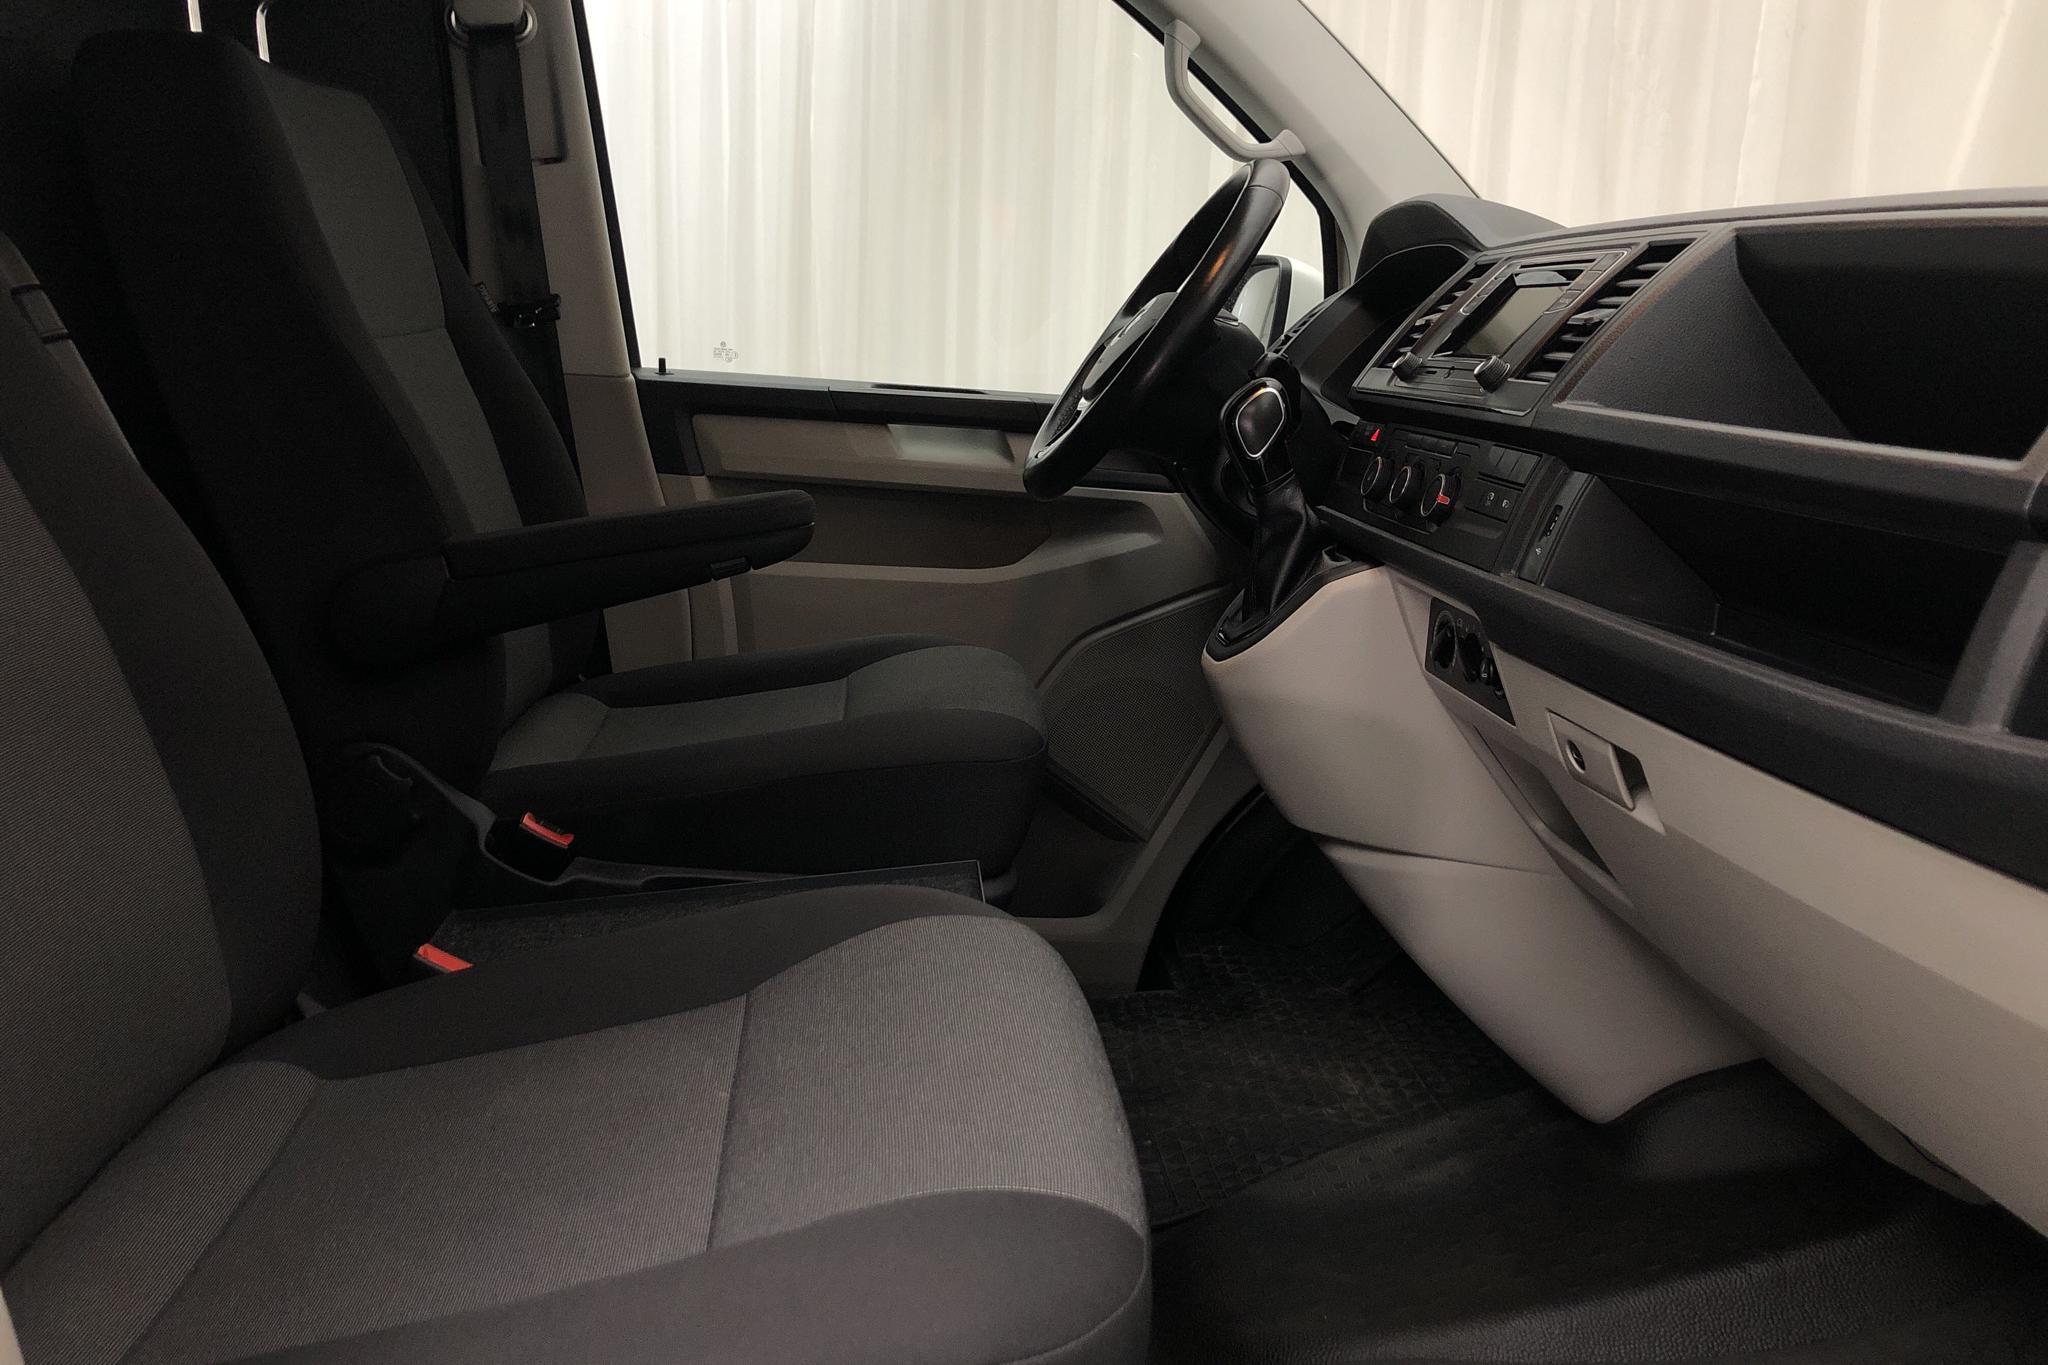 VW Transporter T6 2.0 TDI BMT Skåp (150hk) - 11 280 mil - Automat - vit - 2017